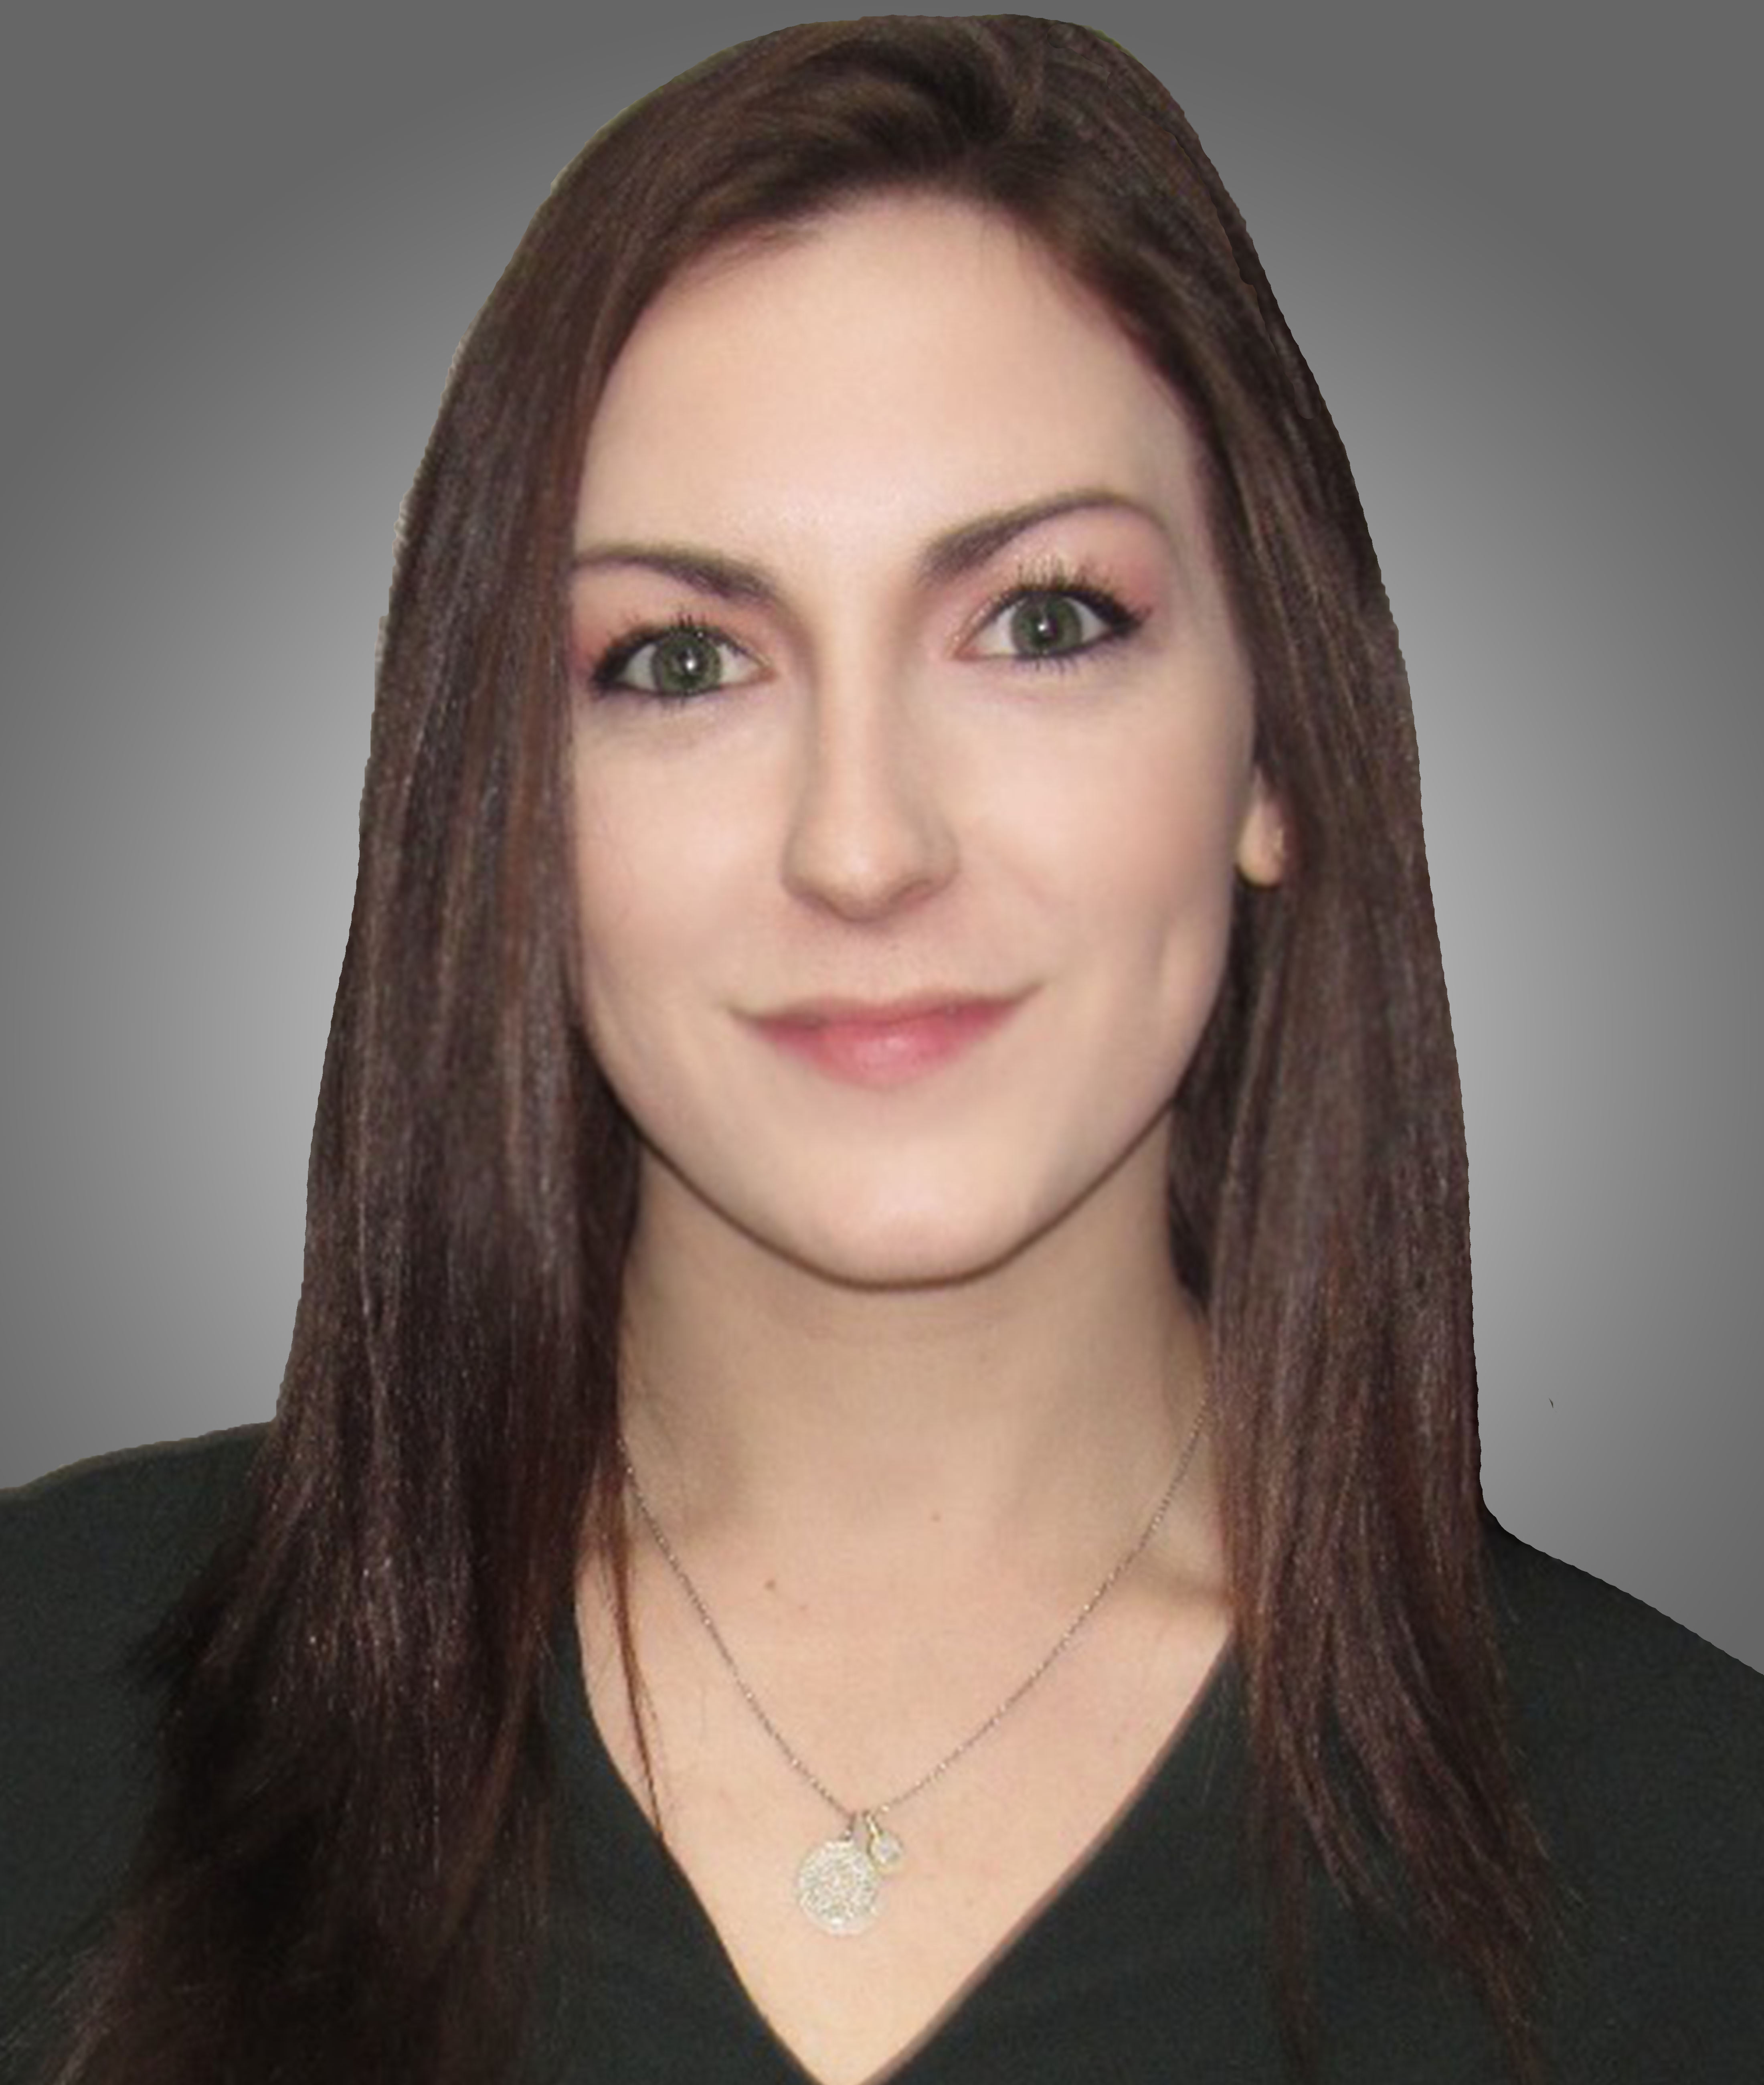 Jessica Schieffer